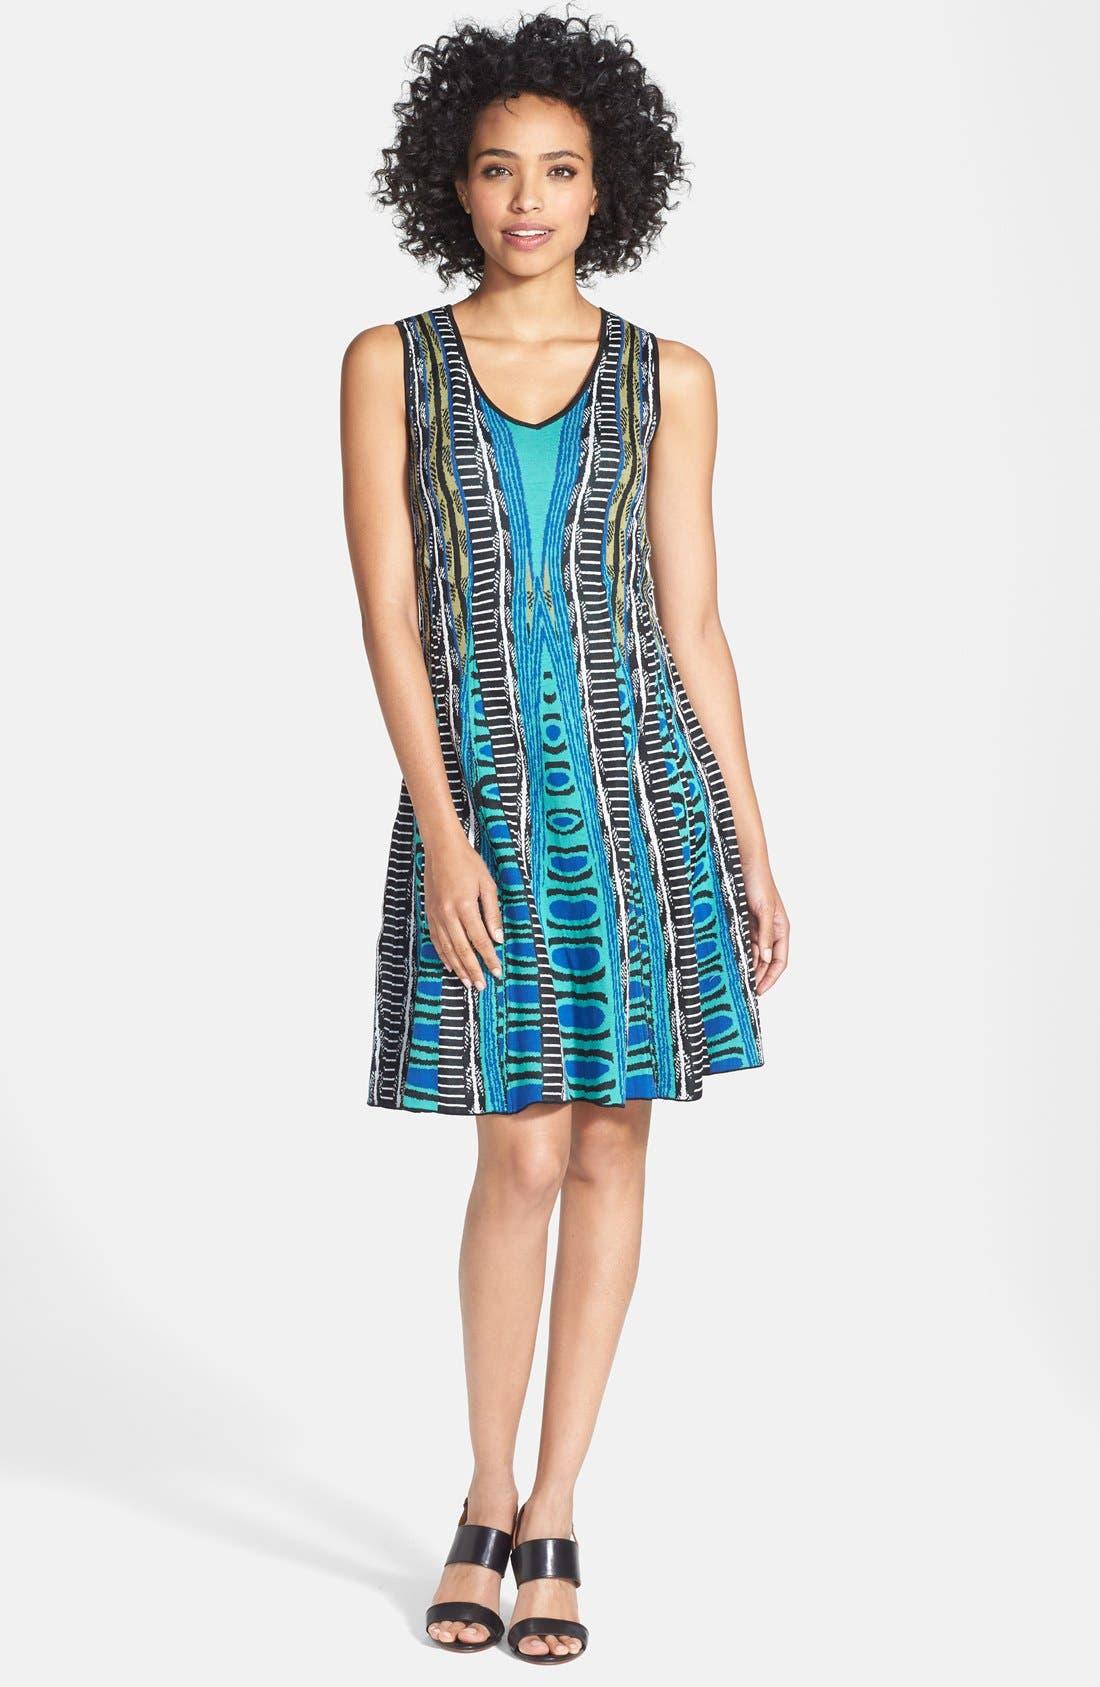 Alternate Image 1 Selected - NIC+ZOE 'Urban Twirl' V-Neck Dress (Regular & Petite)